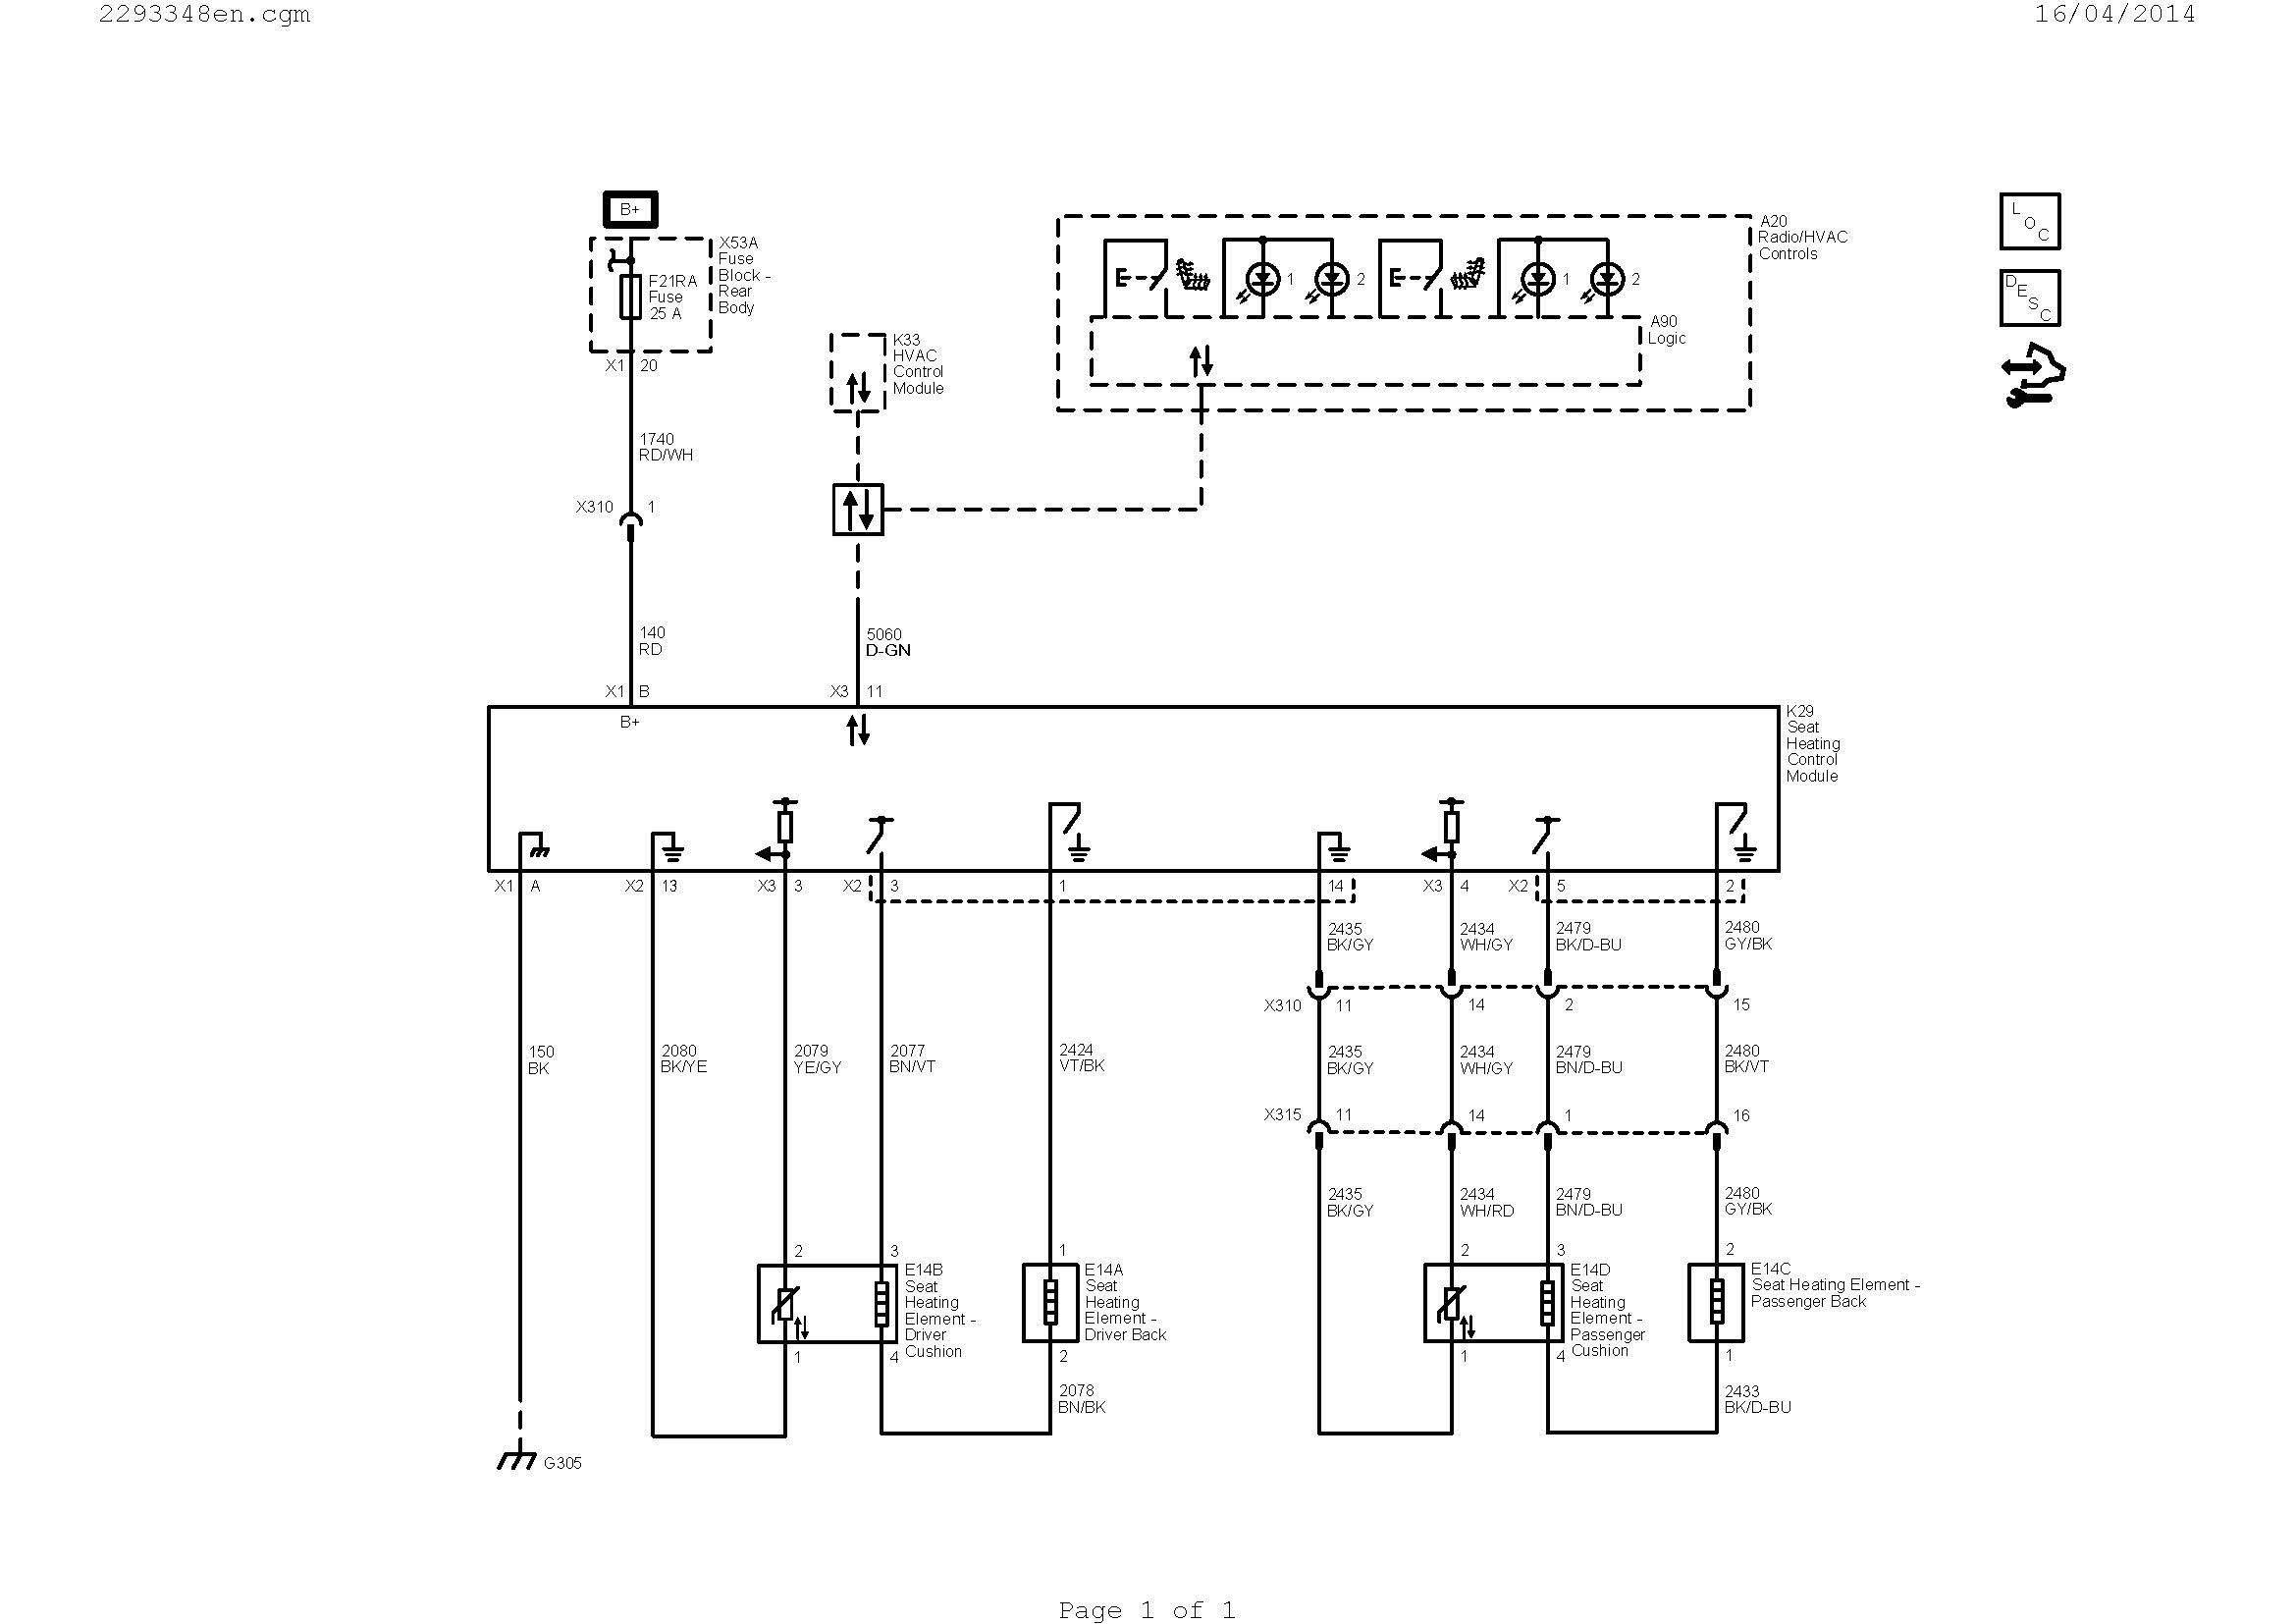 honda c70 wiring diagram images fresh wiring diagram for light bulb throughout electrical plug wiring diagram [ 2339 x 1654 Pixel ]